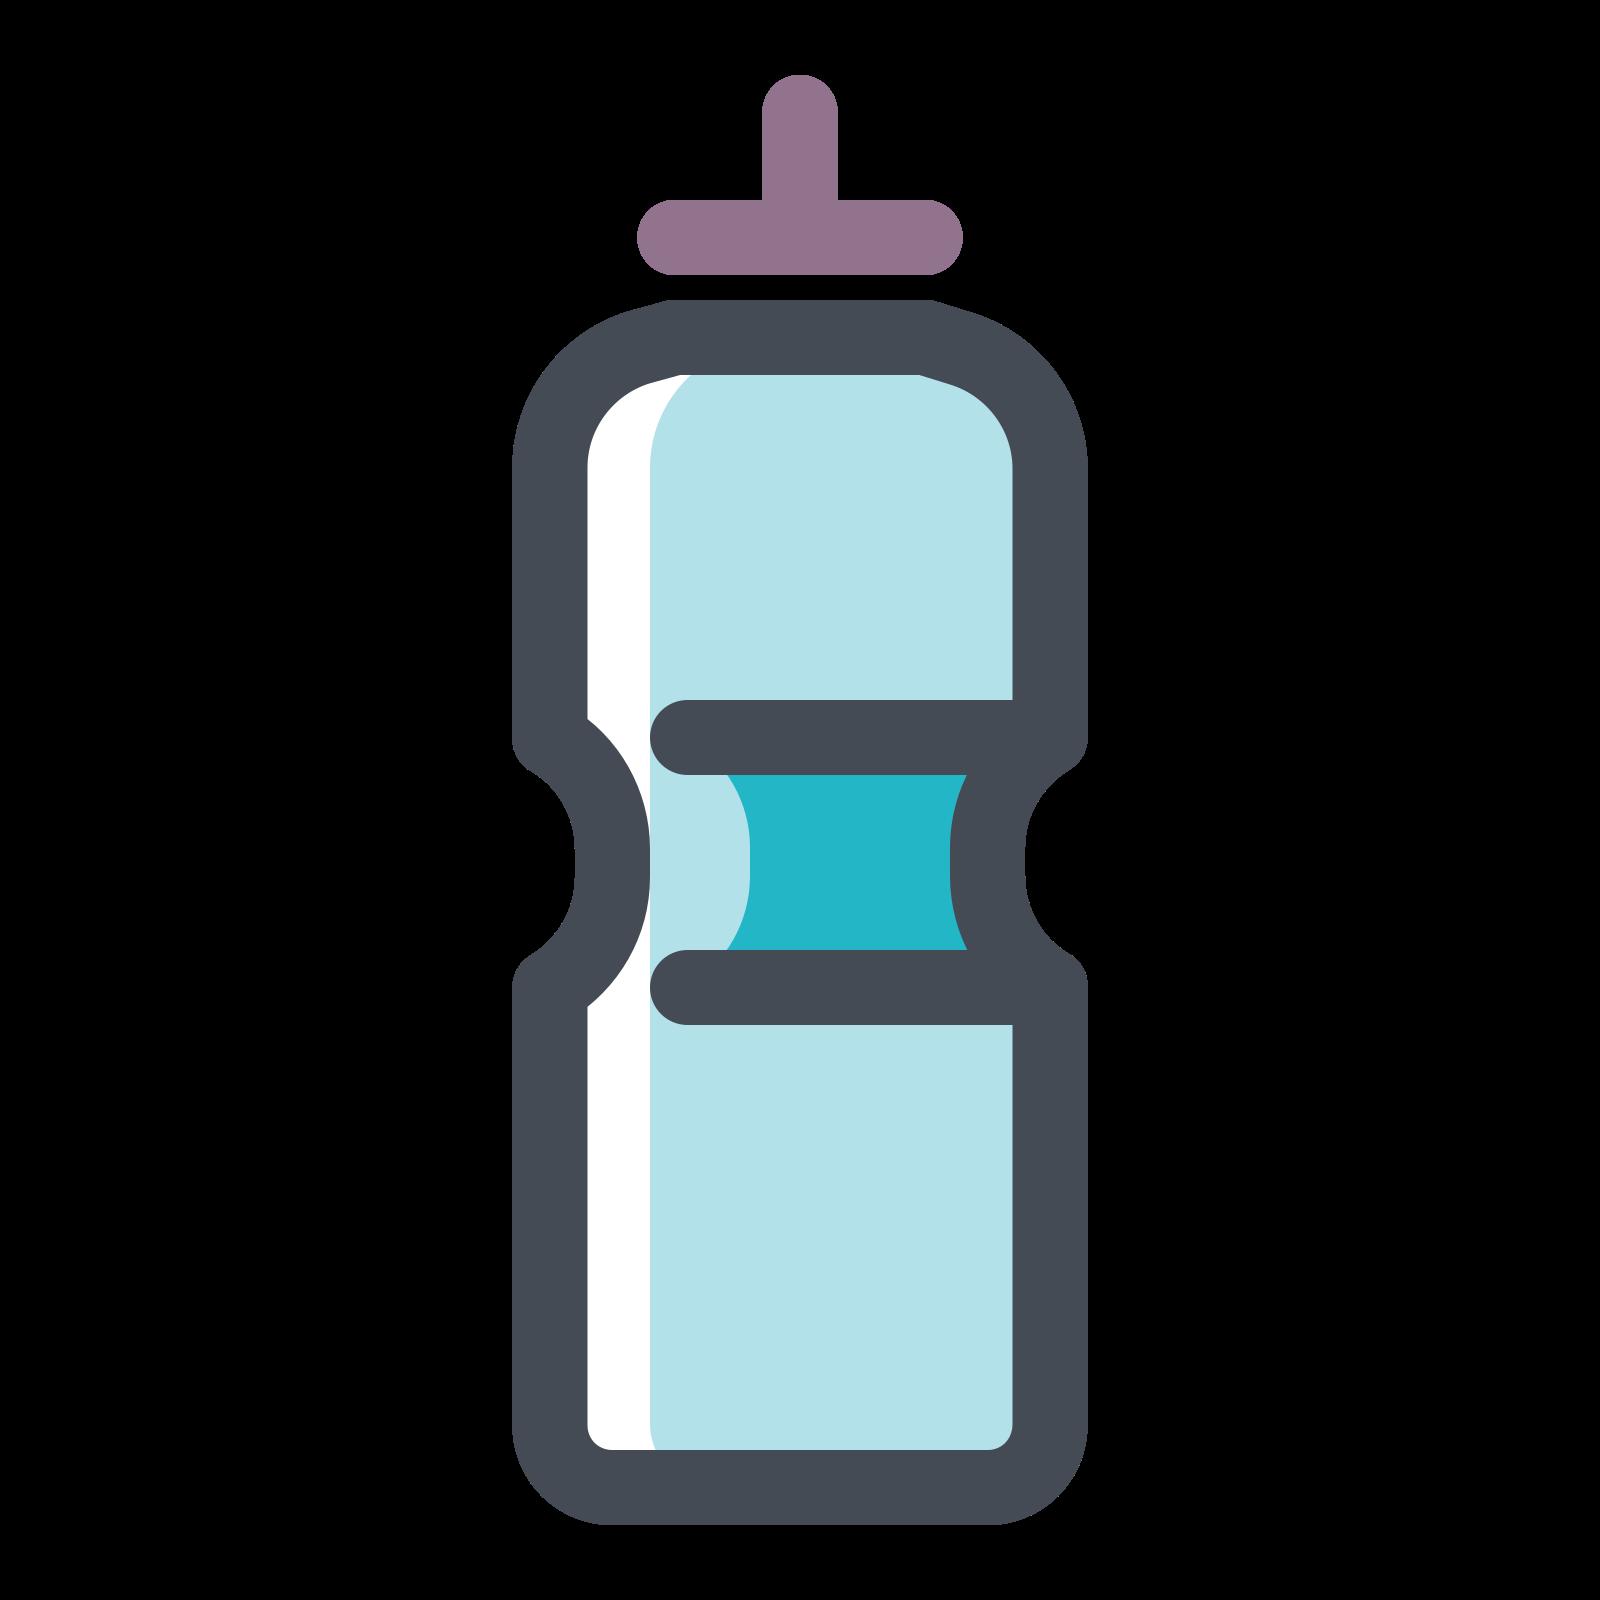 Butelka sportowa icon